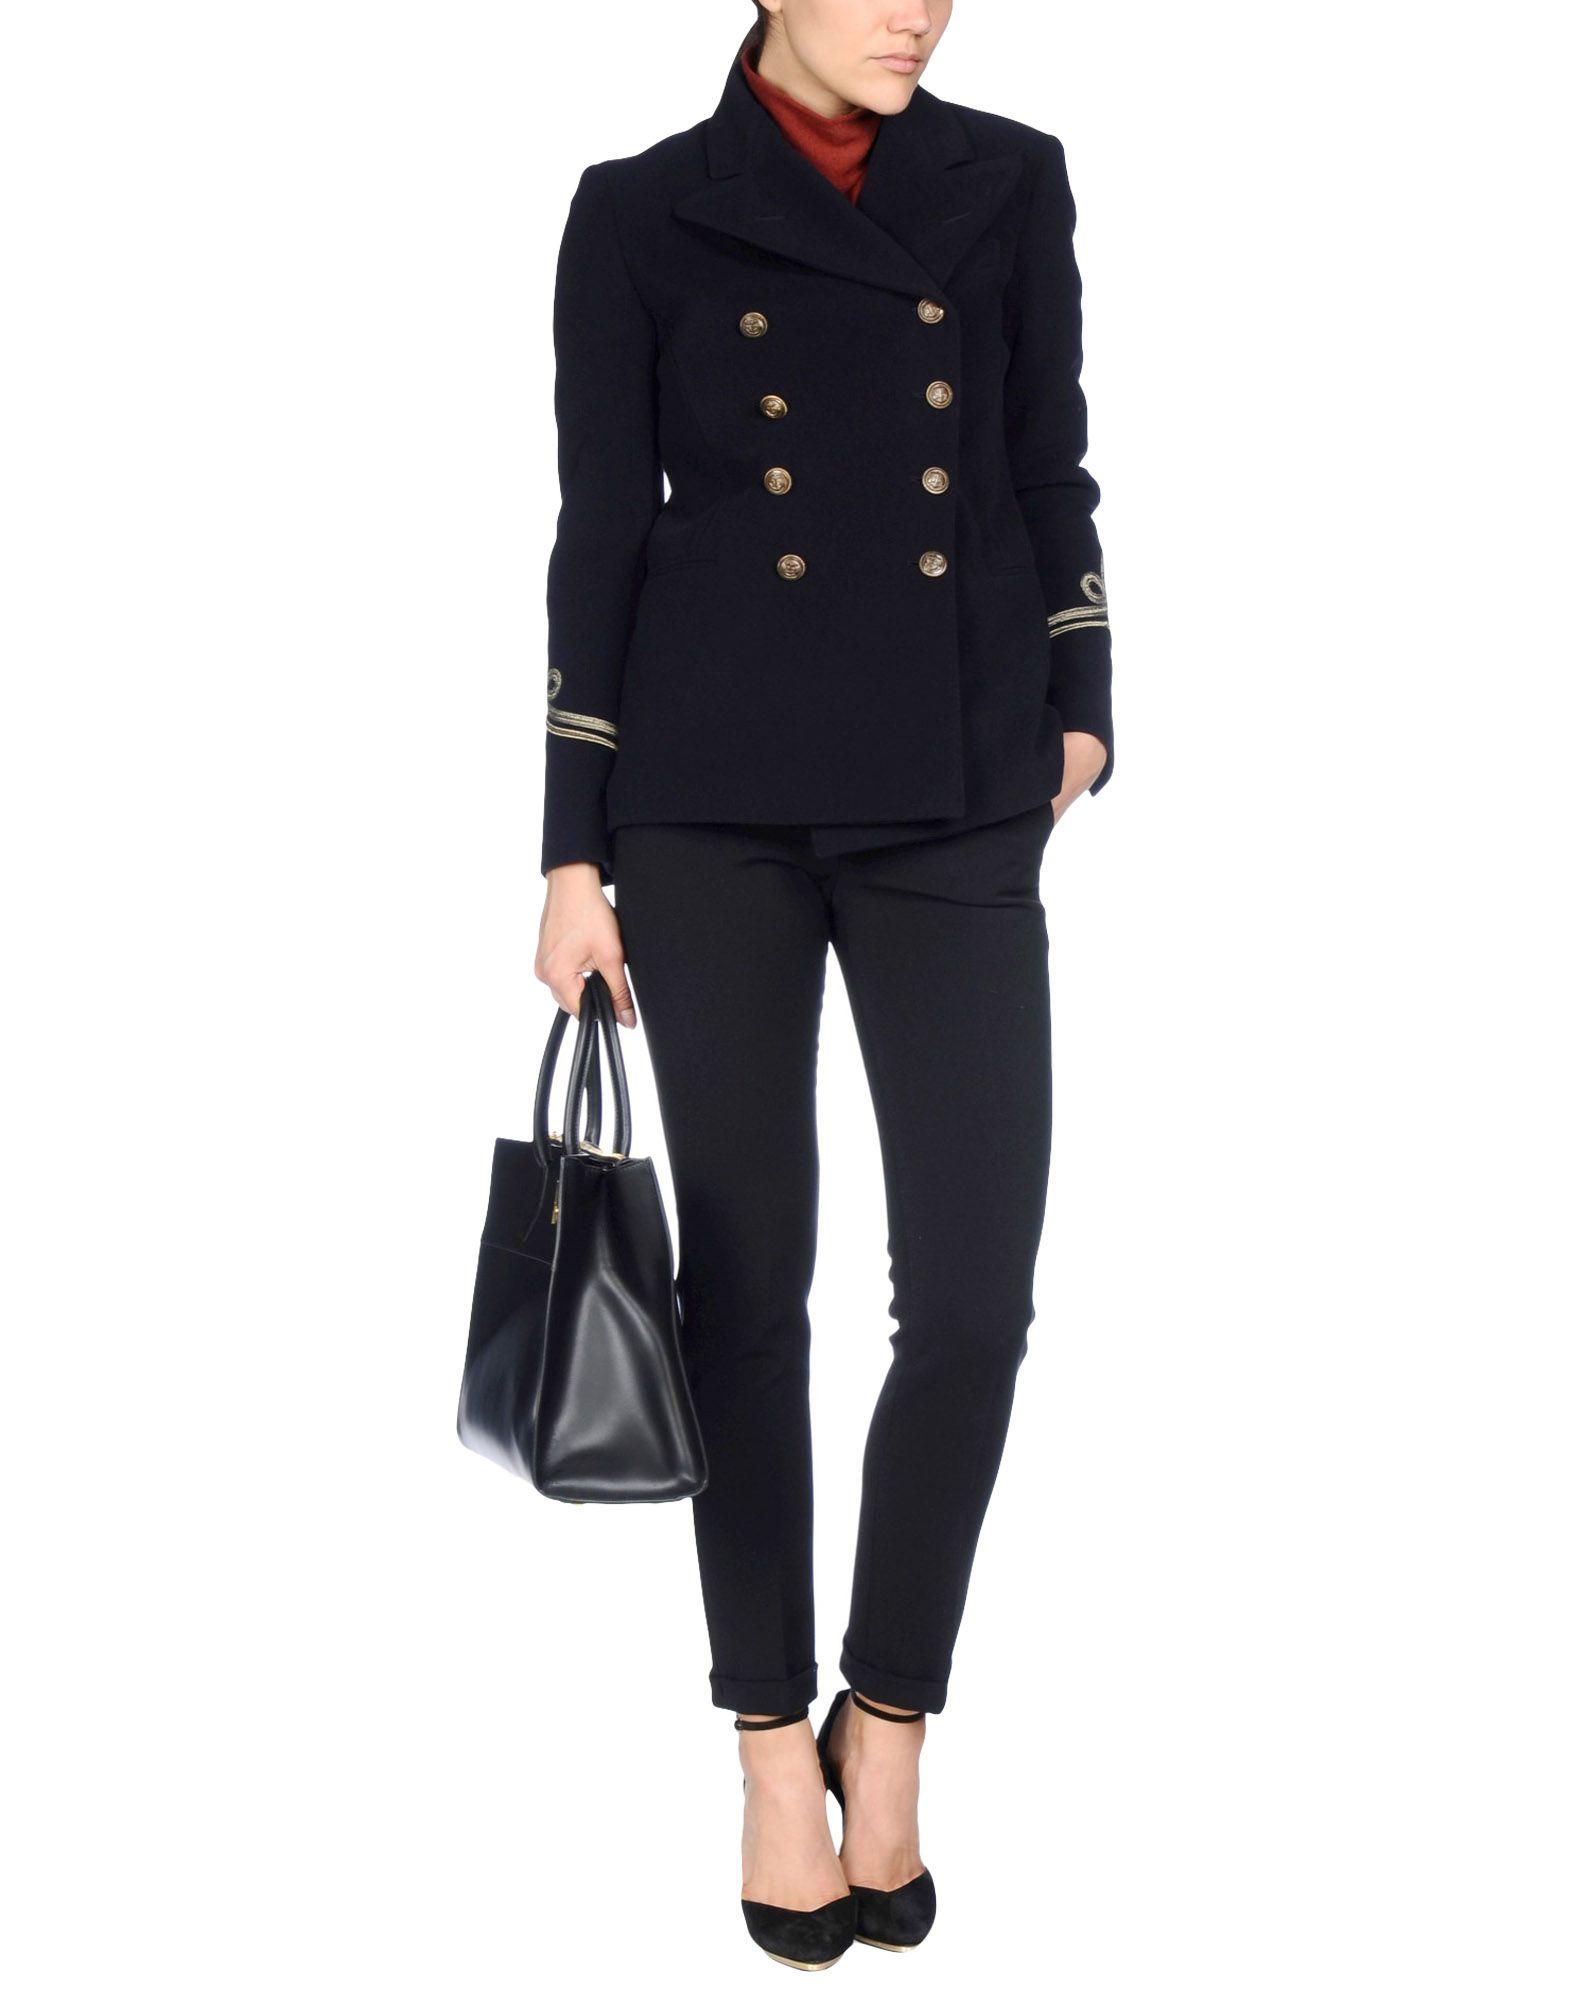 ralph lauren women custom wool crest blazer male models. Black Bedroom Furniture Sets. Home Design Ideas